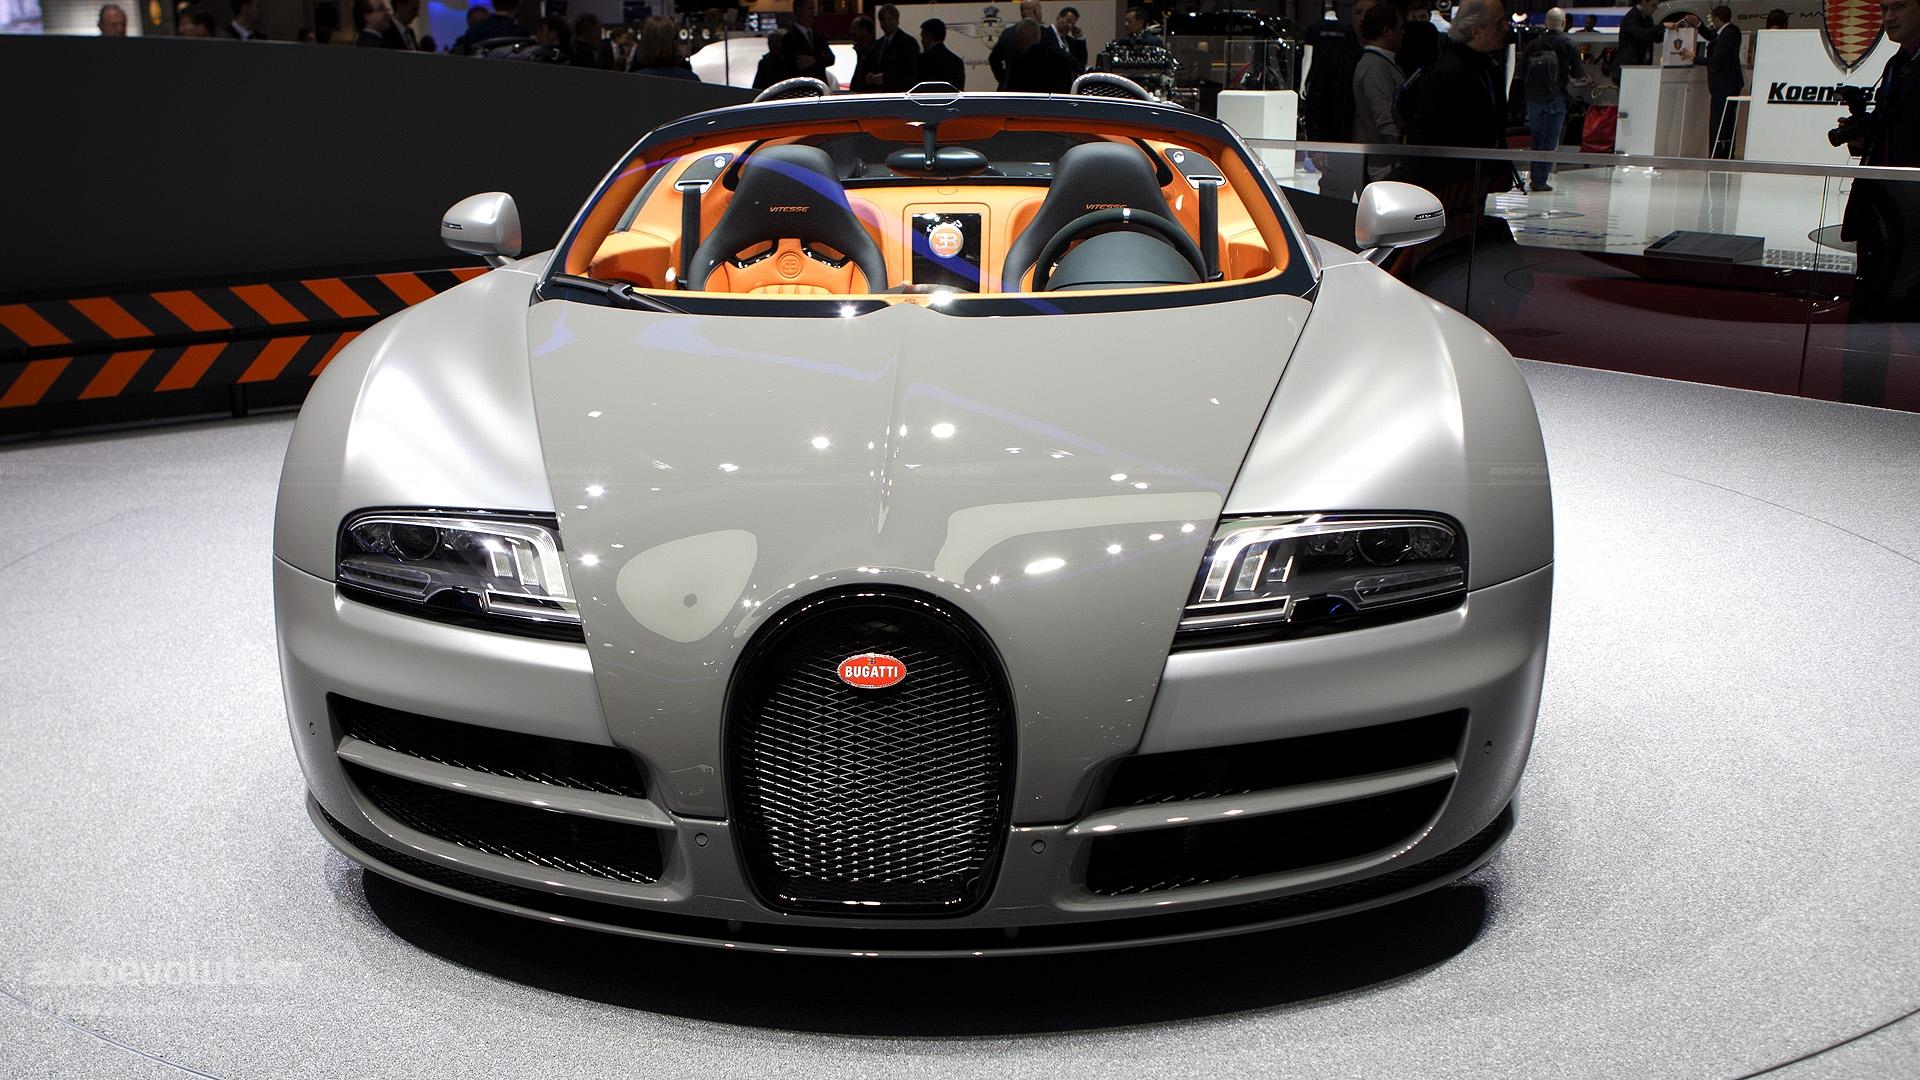 geneva 2012 bugatti veyron grand sport vitesse live photos autoevolution. Black Bedroom Furniture Sets. Home Design Ideas